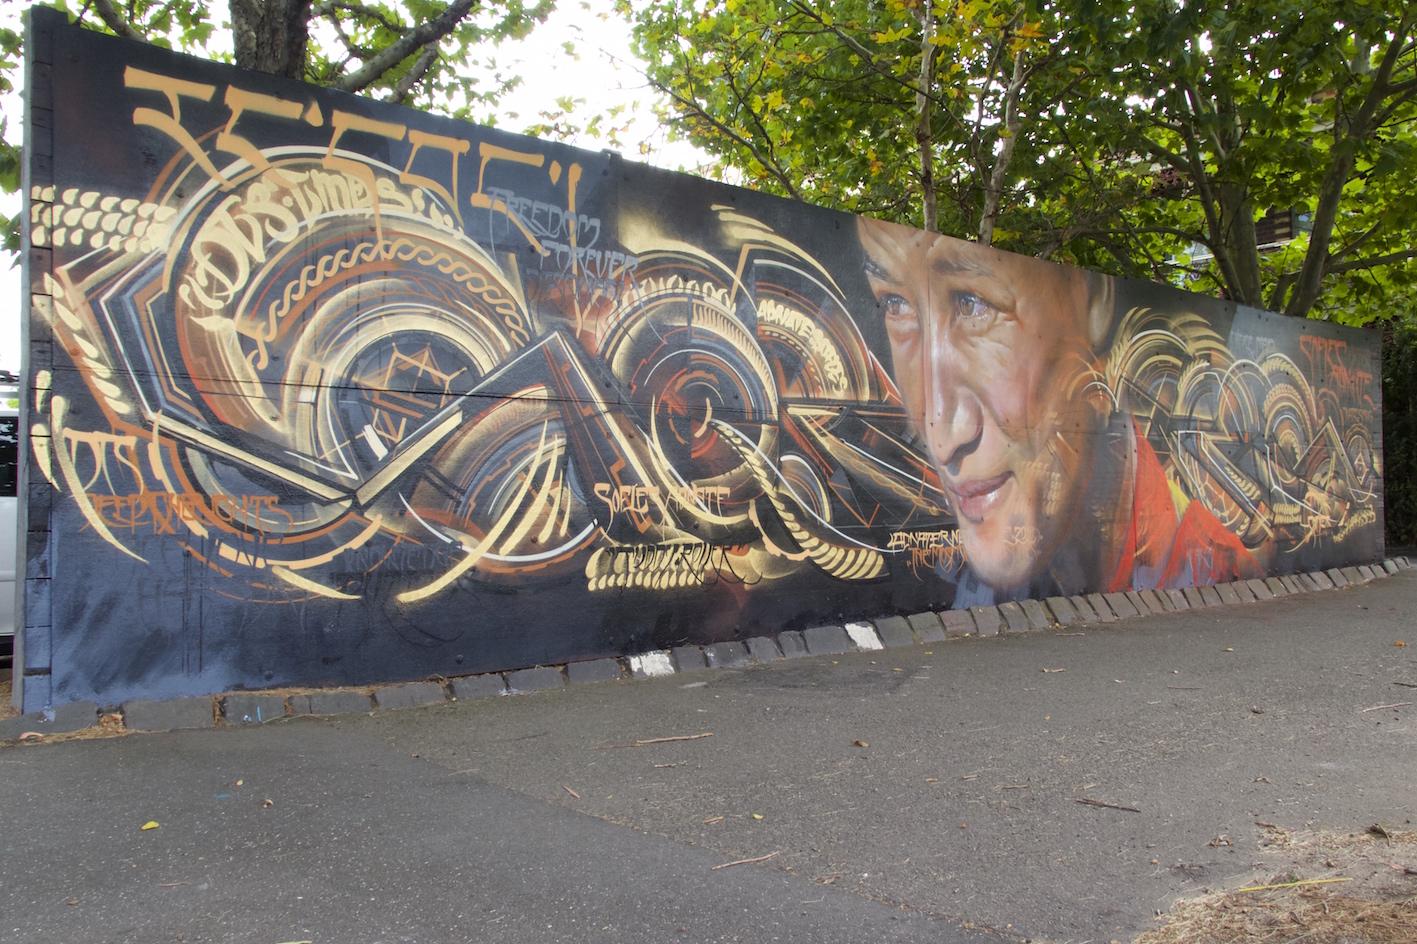 deansunshine_landofsunshine_melbourne_streetart_graffiti_ADNATE SOFLES COLLAB 1